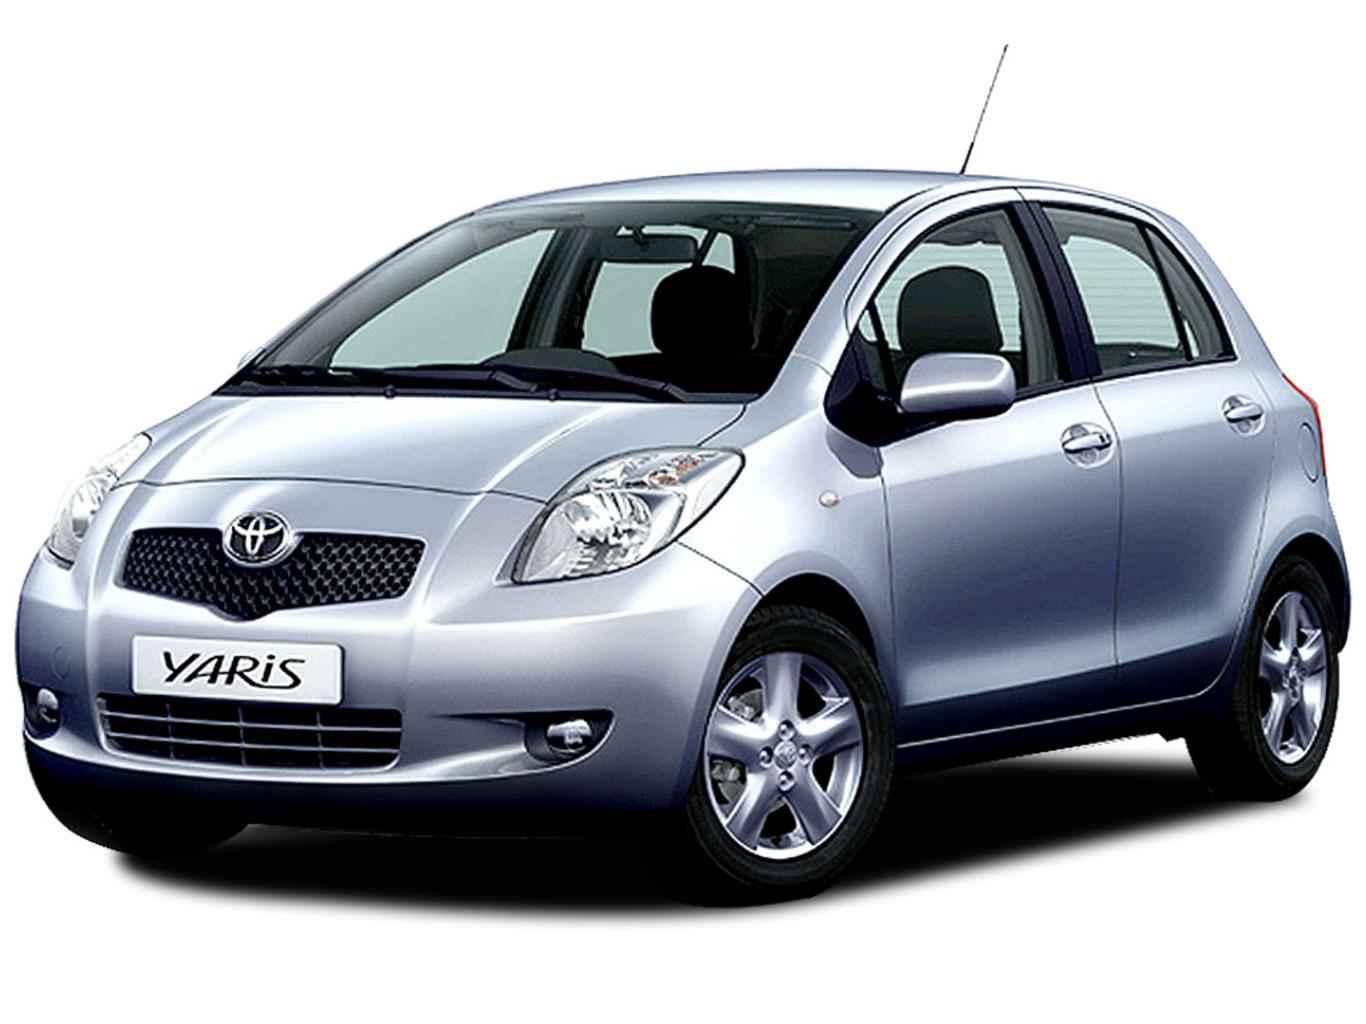 Toyota Yaris, alonissos, alonnisos